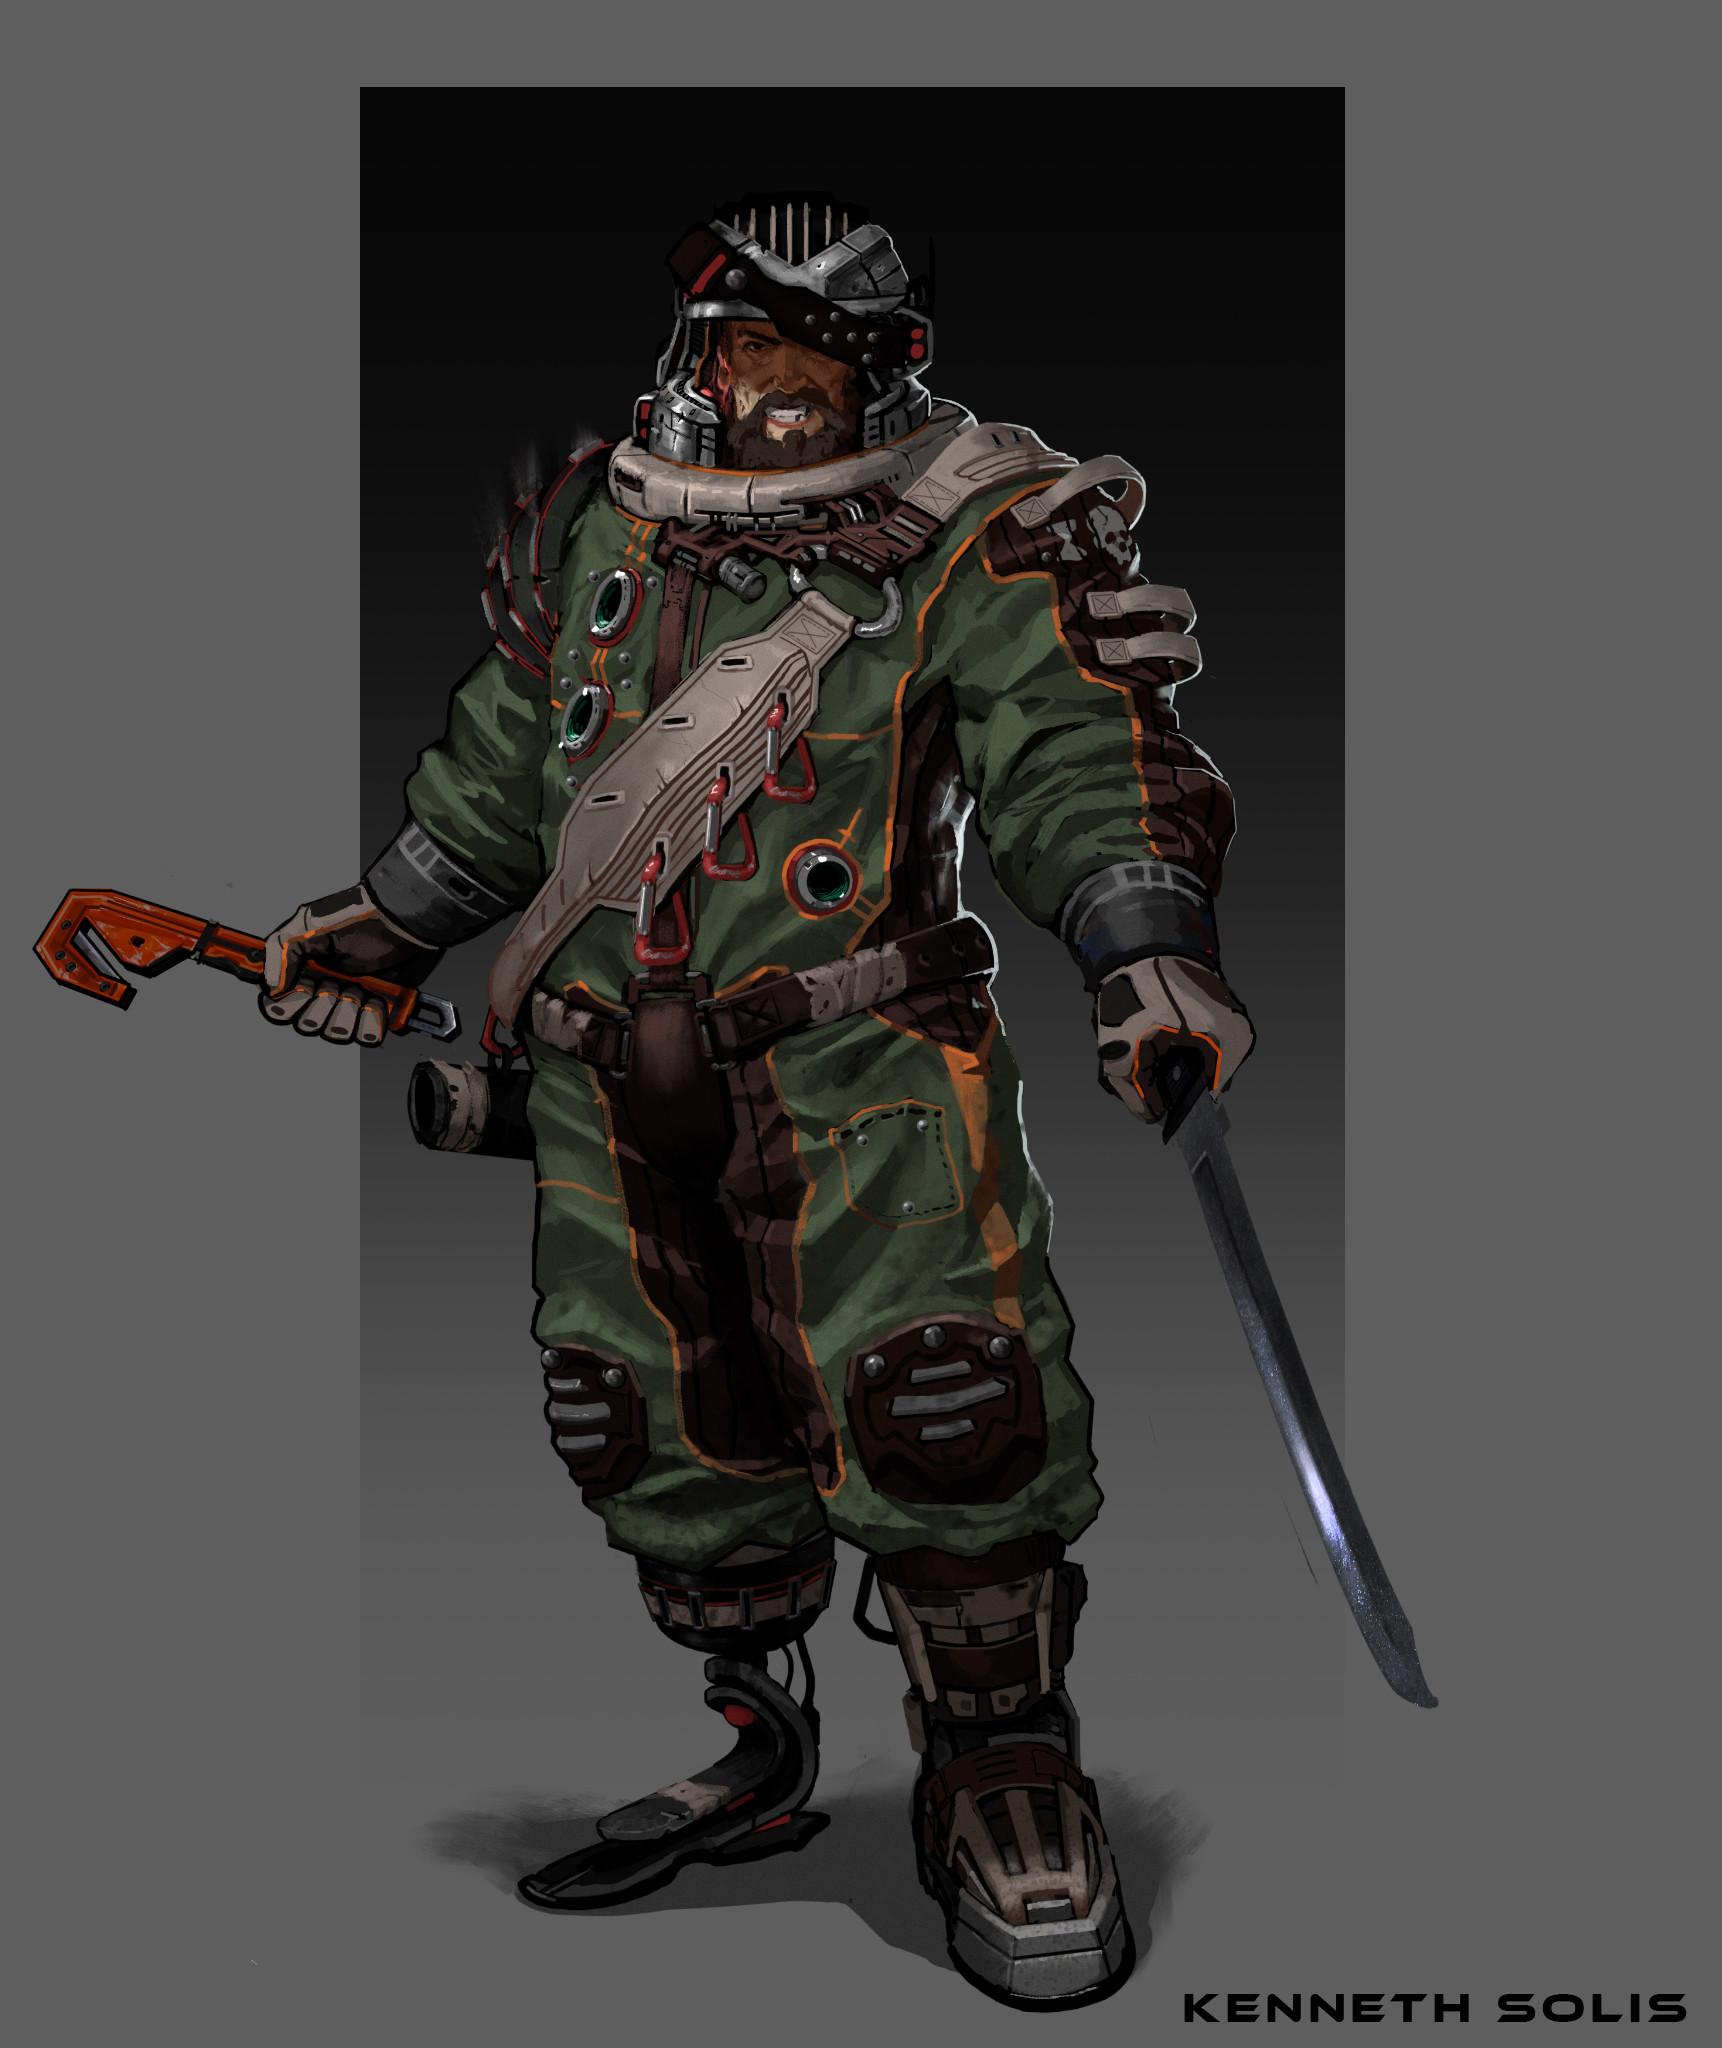 kenneth-solis-ks-pirates2-pirate.jpg?1488090448